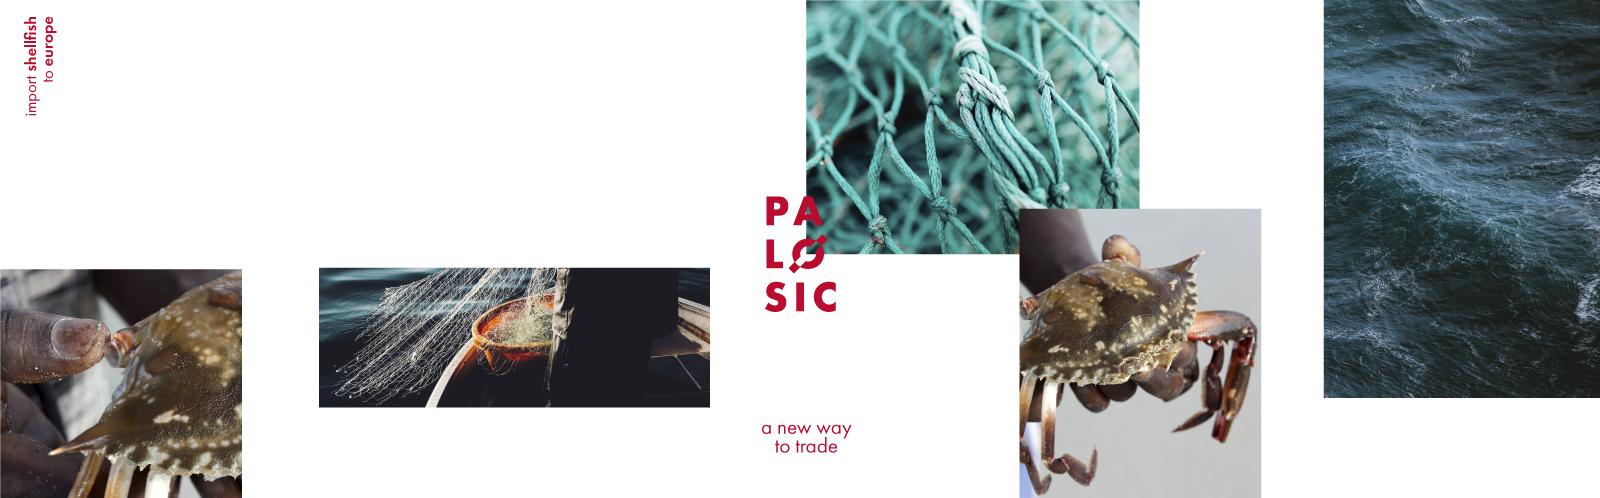 comunicacao-palosic-activemedia